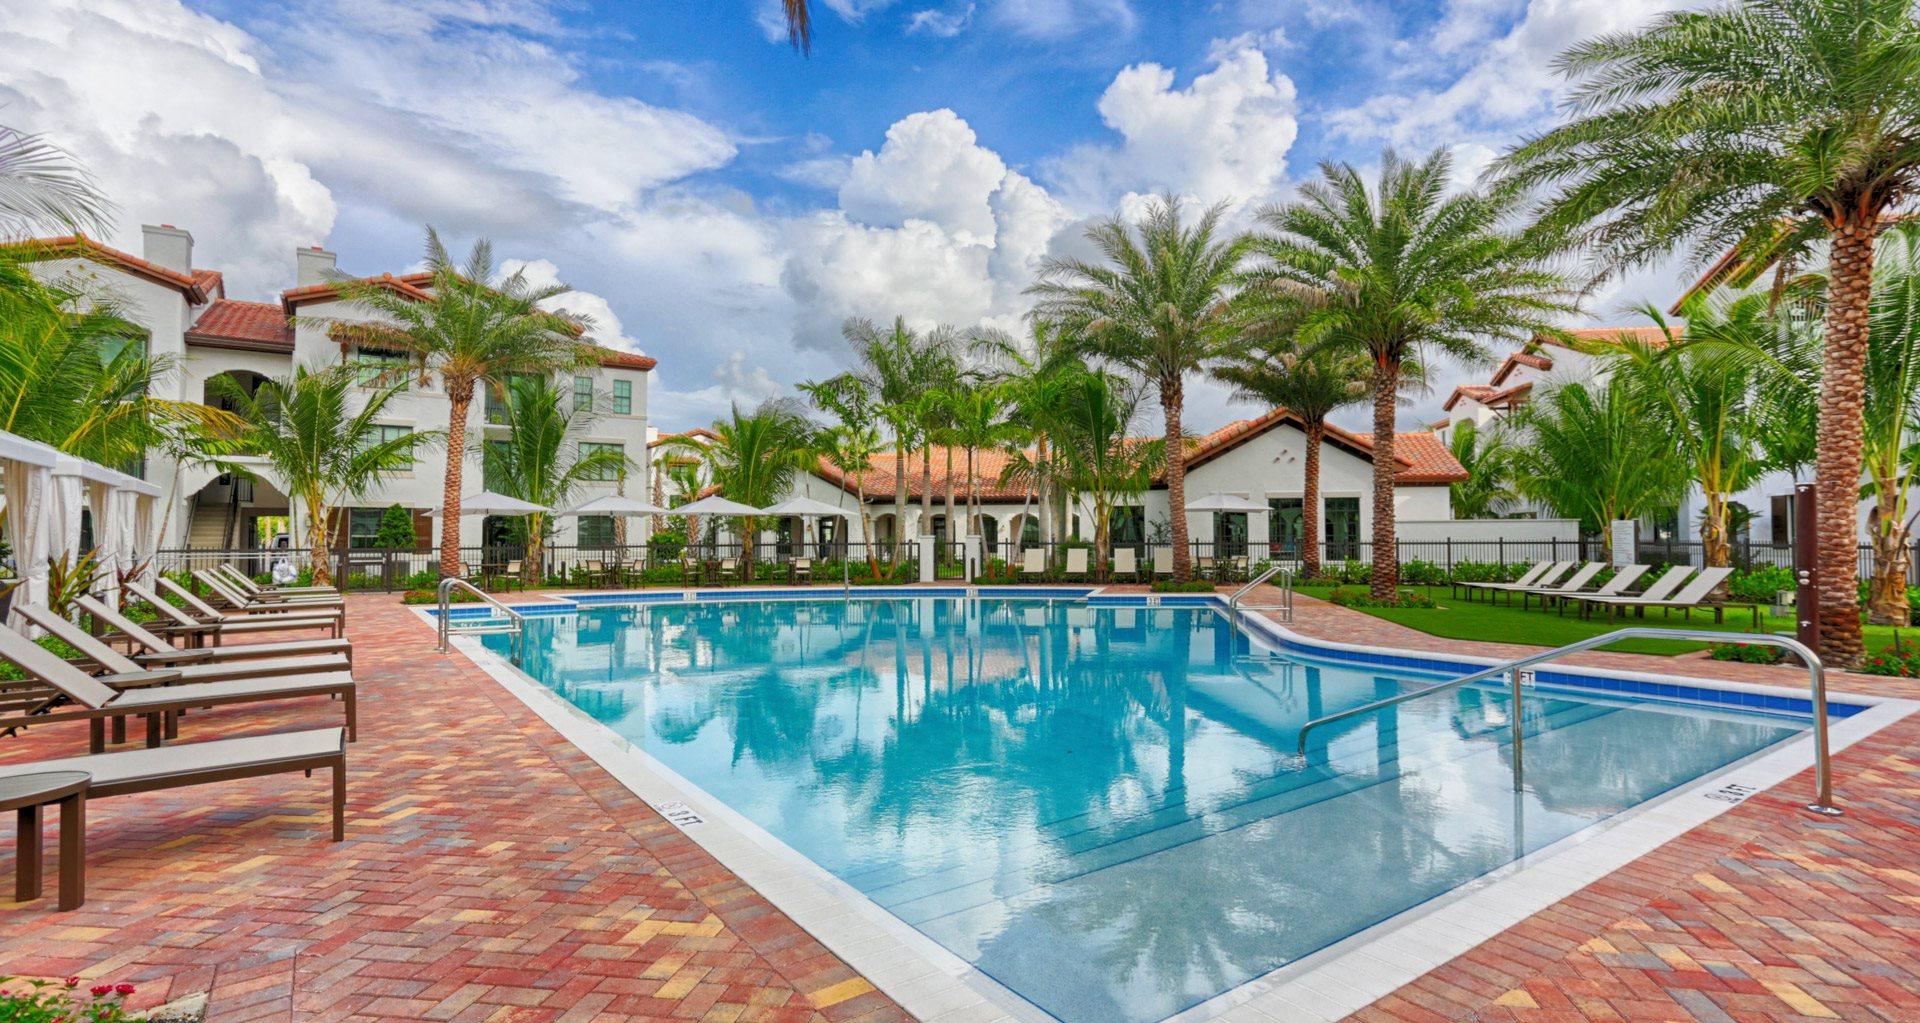 Resort-Style Zero-Entry Pool at Mirador at Doral by Windsor, Florida, 33122